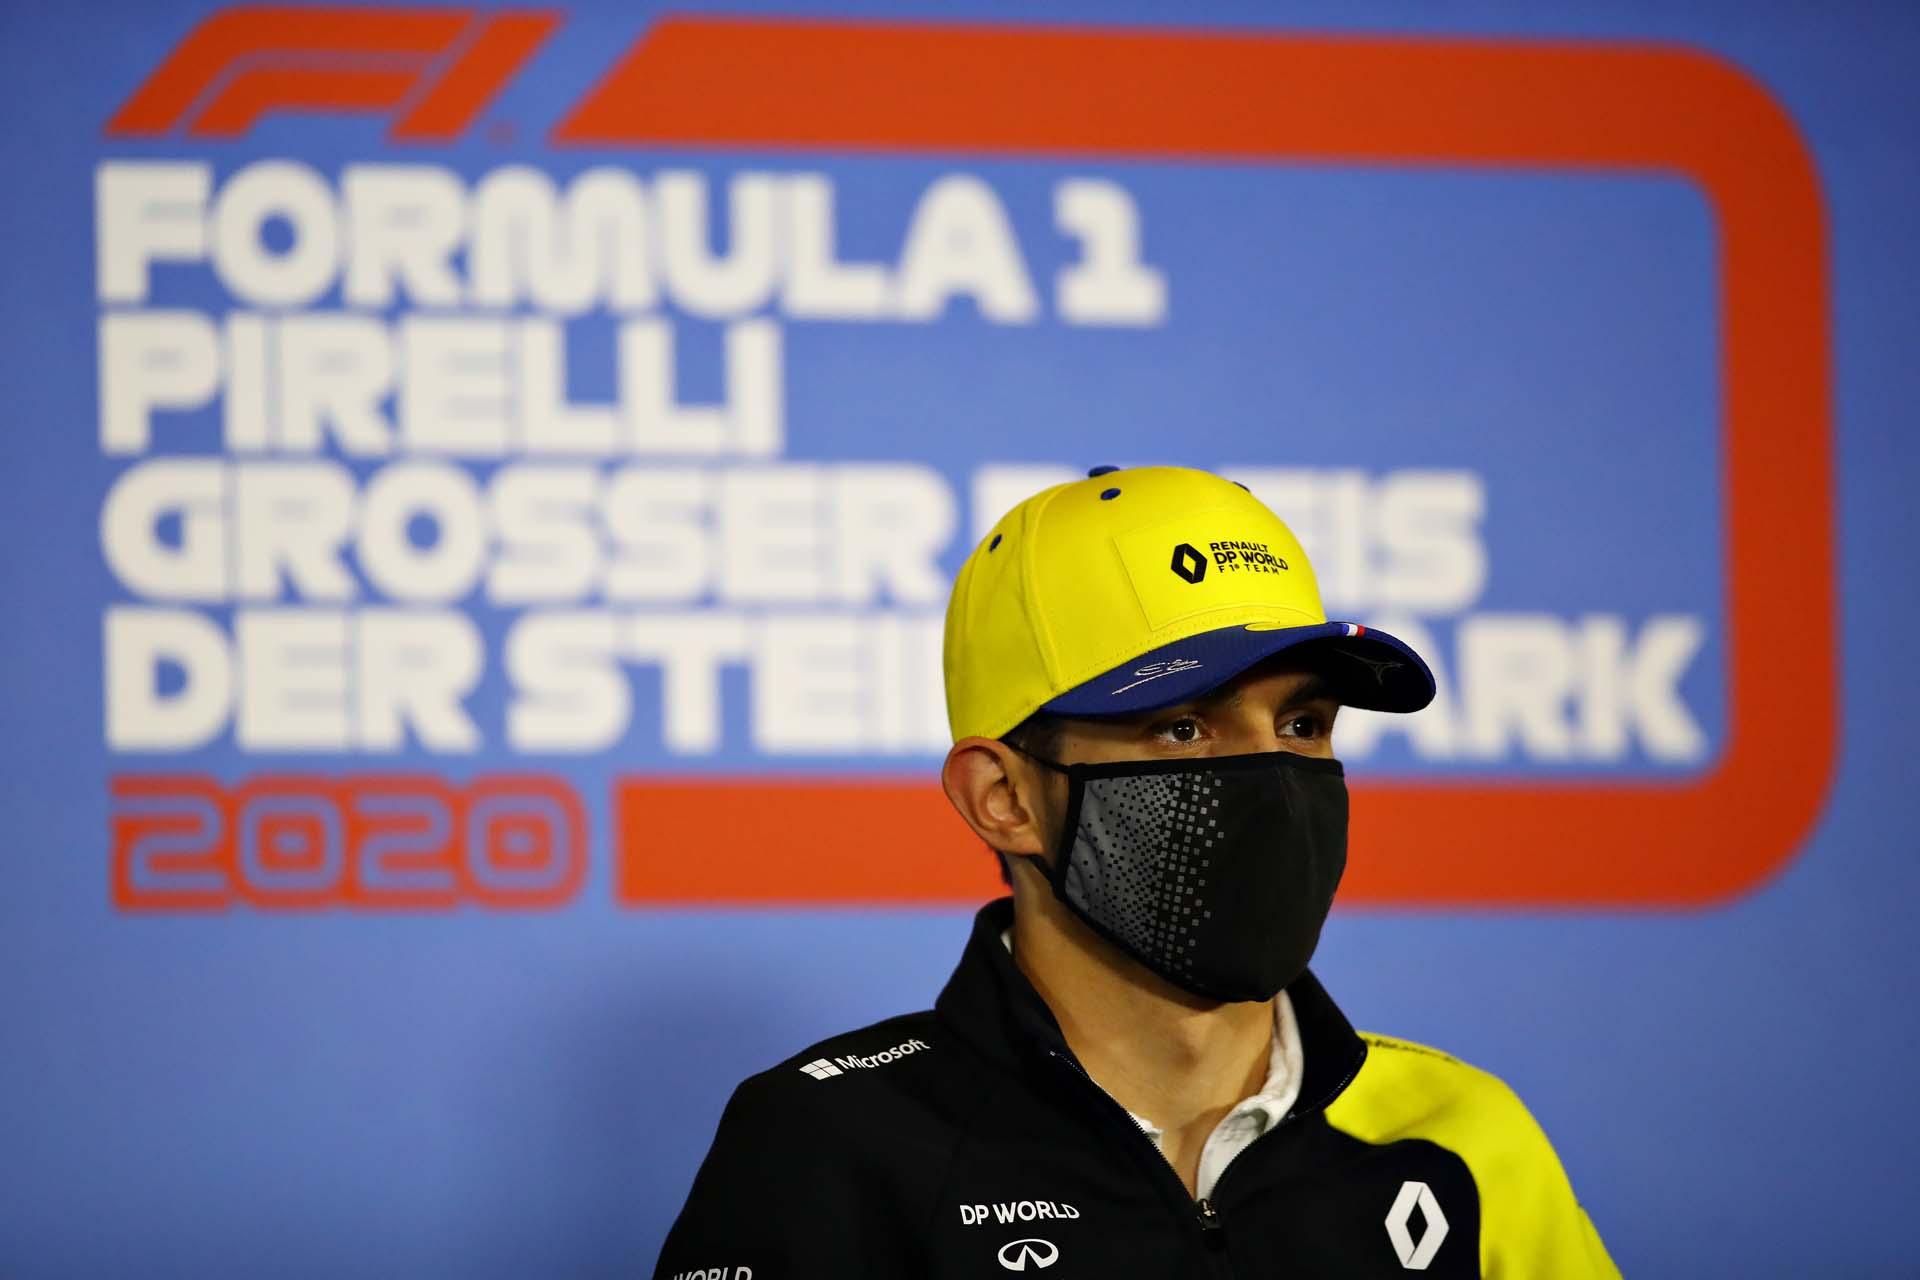 Motor Racing - Formula One World Championship - Steiermark Grand Prix - Preparation Day - Spielberg, Austria